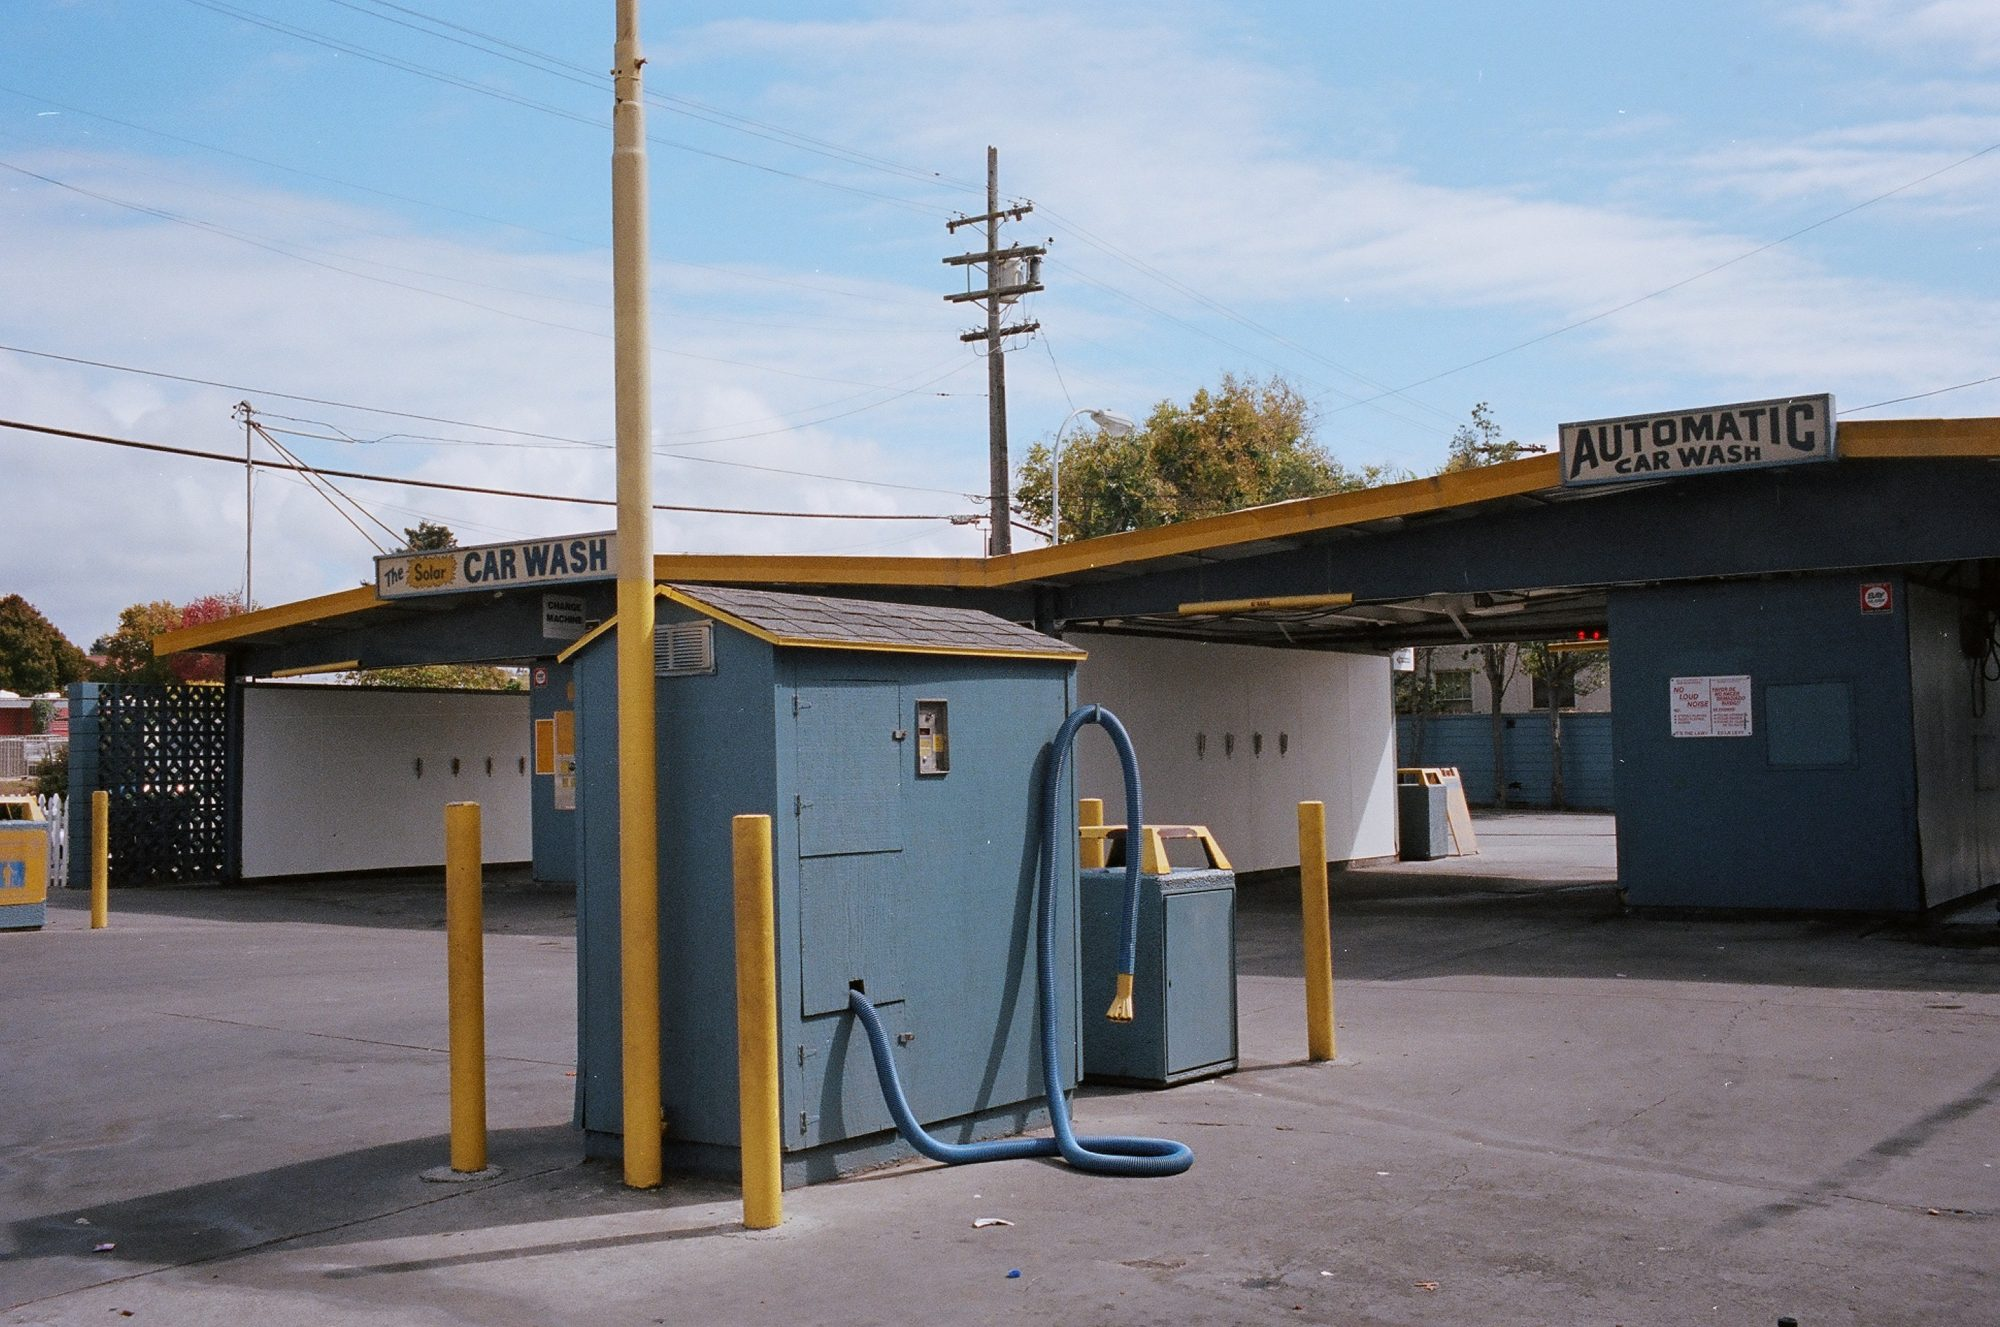 Urban landscape of car wash. Berkeley, 2013